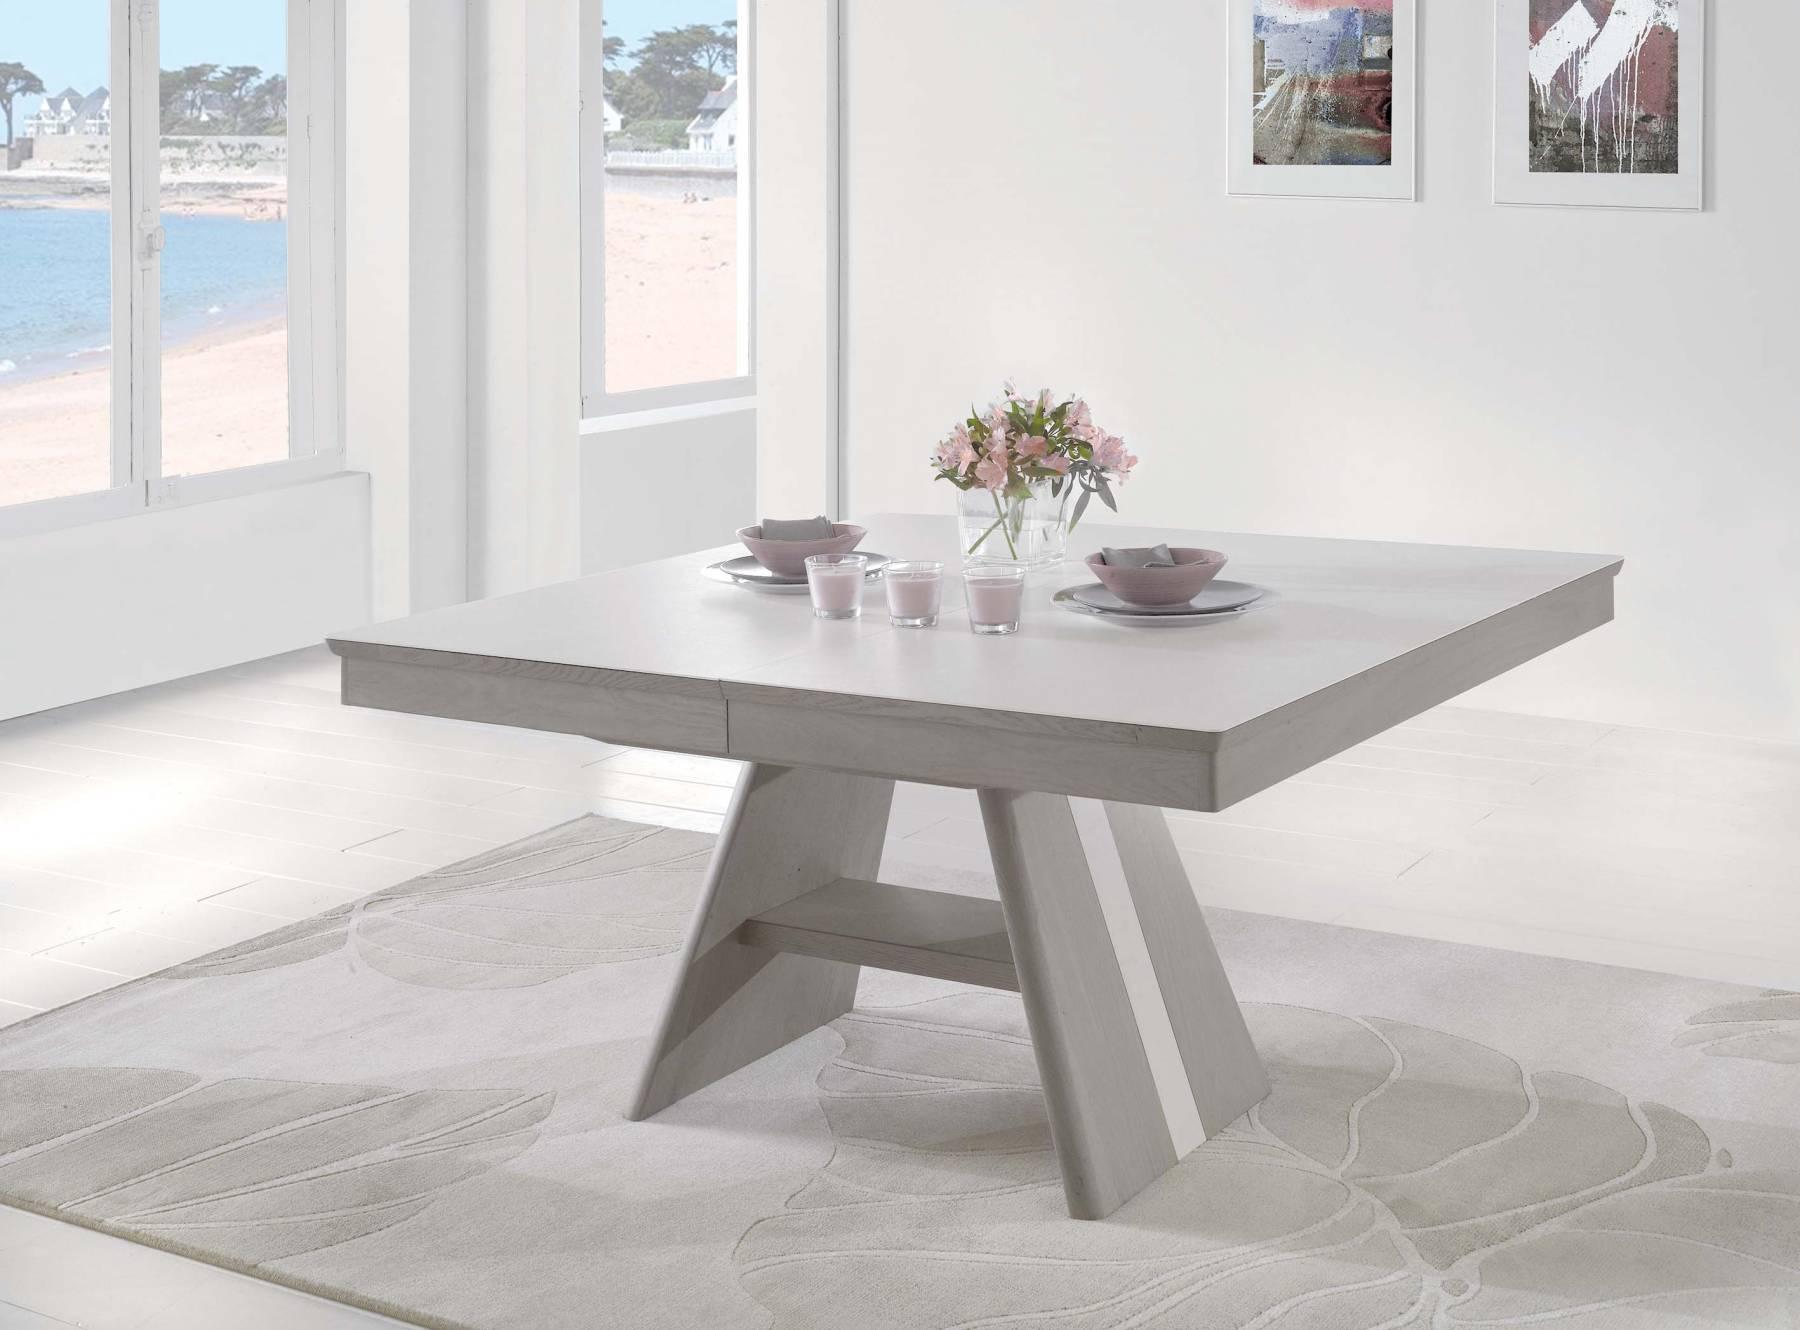 salle manger deauvil ateliers de langres meubles gibaud magasin nord. Black Bedroom Furniture Sets. Home Design Ideas